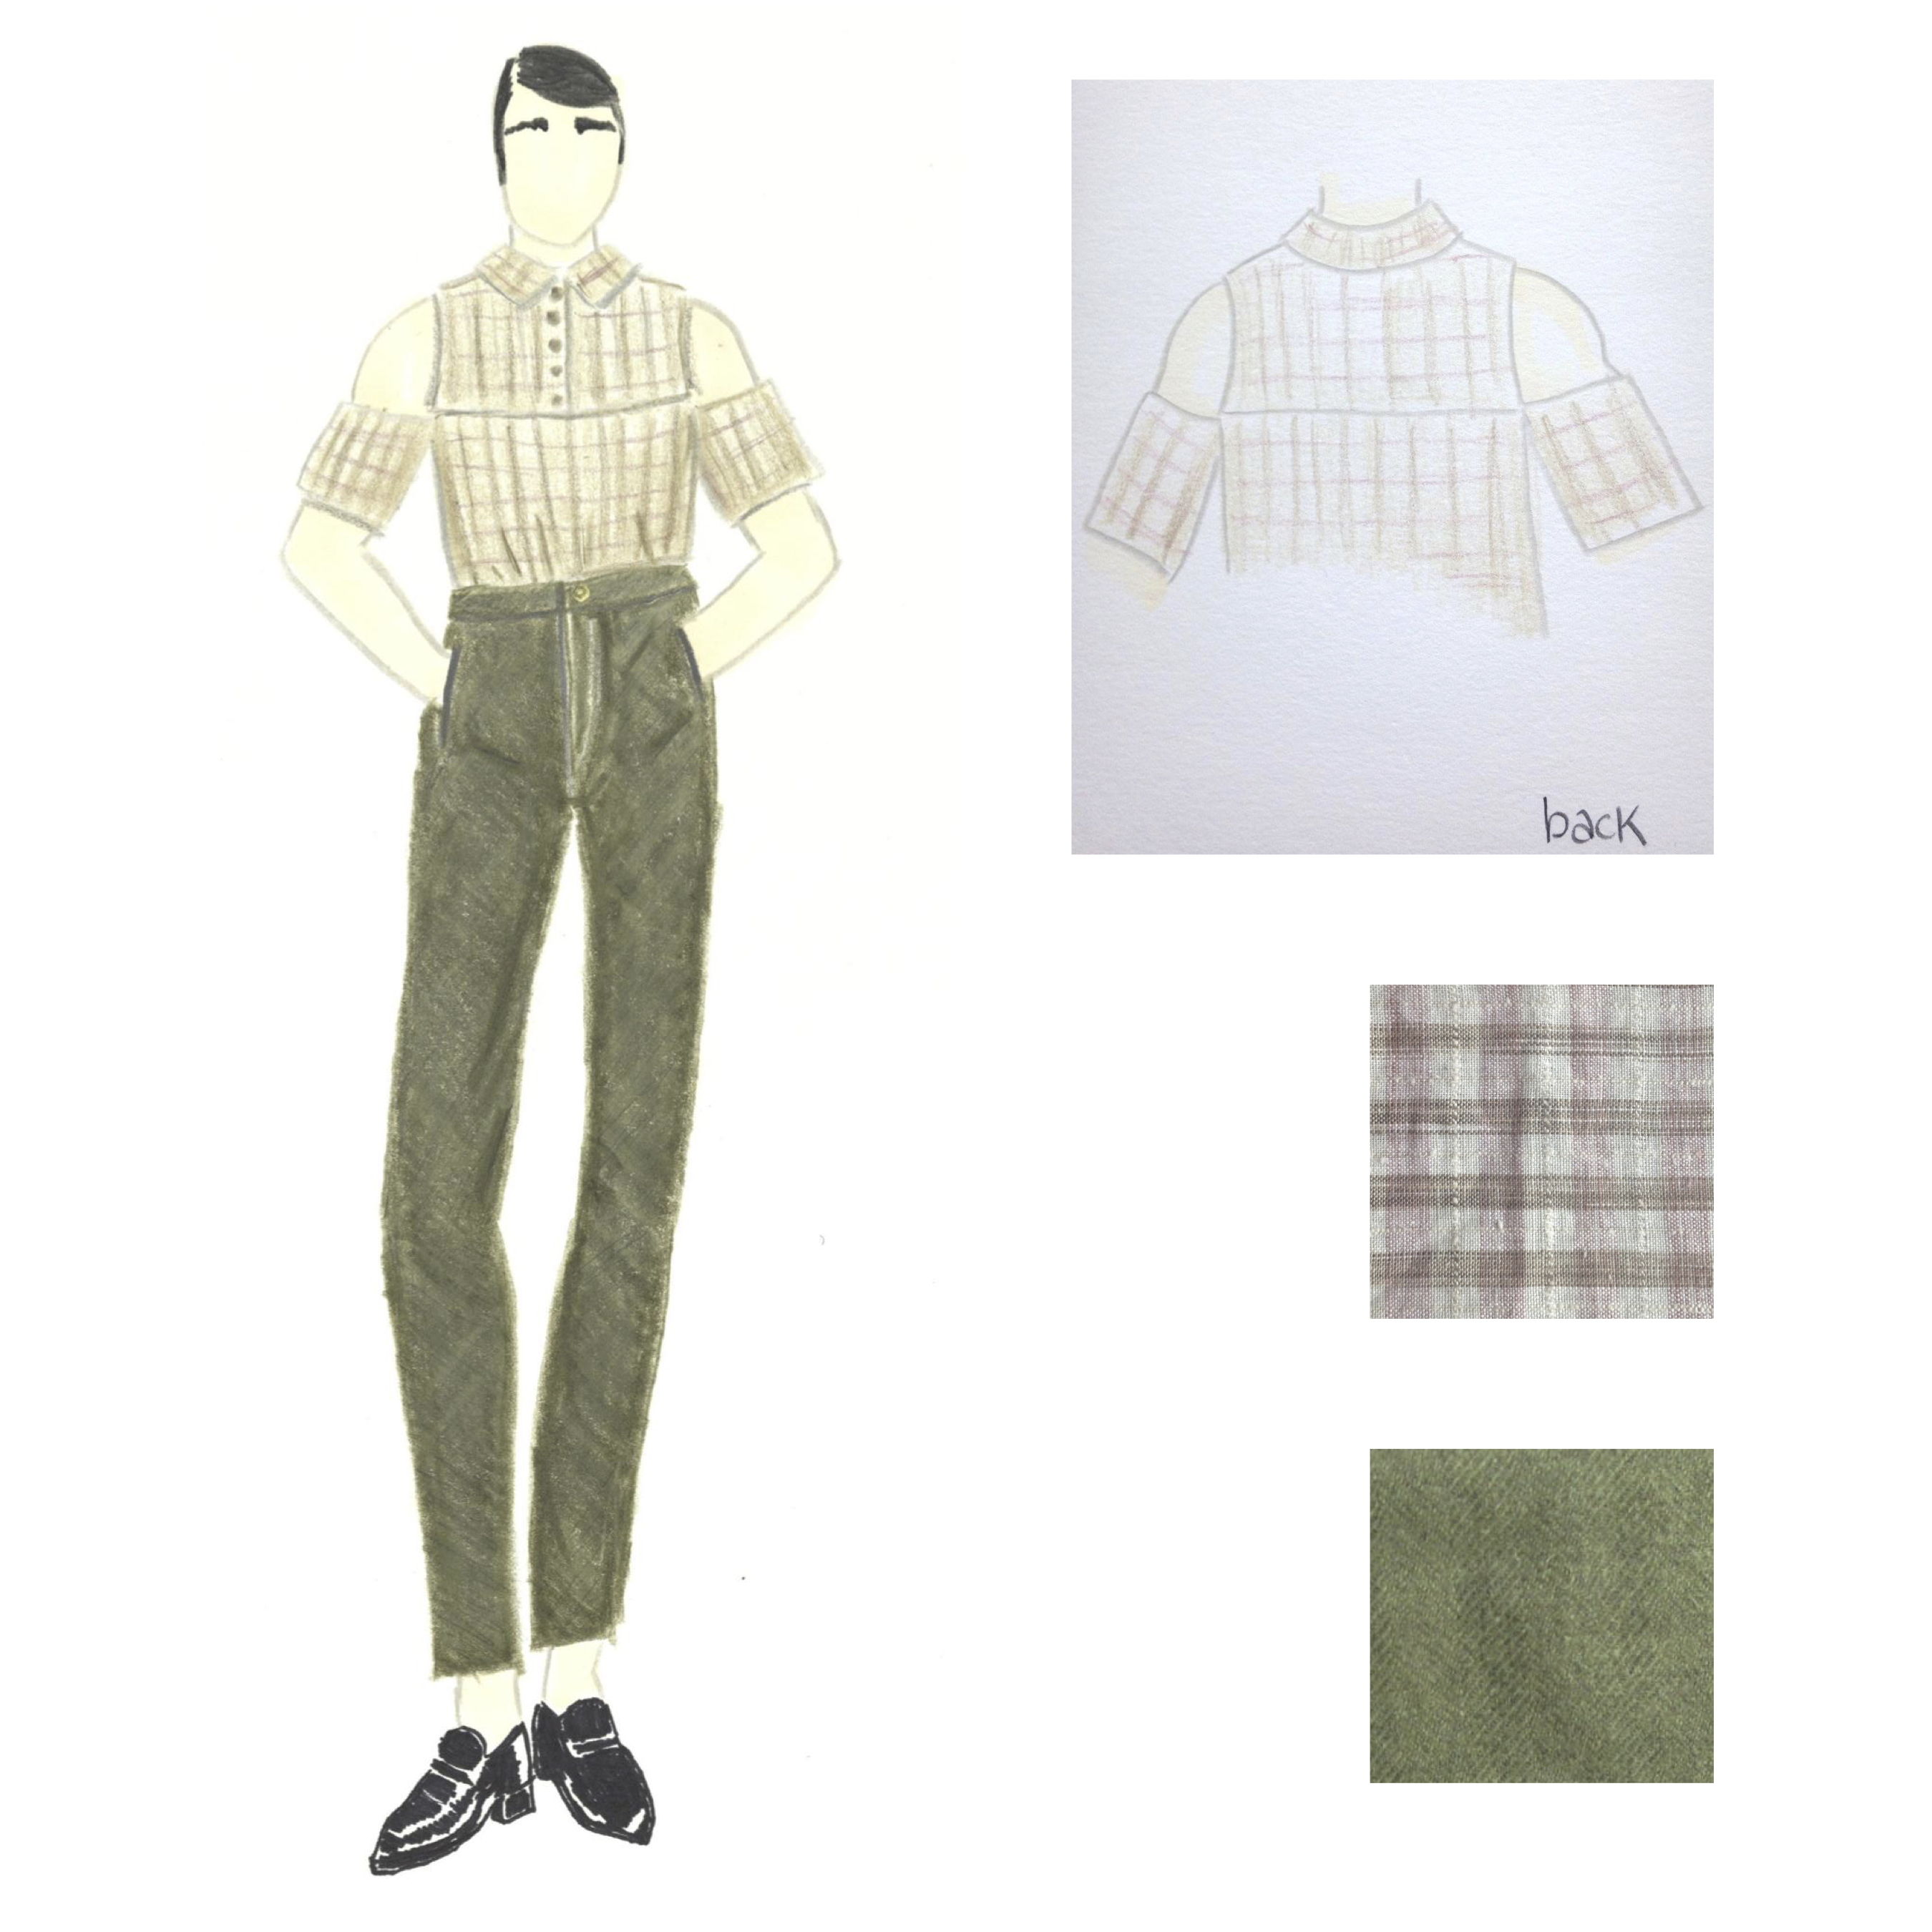 Kvietok_Fashion Illustration Collection (2)